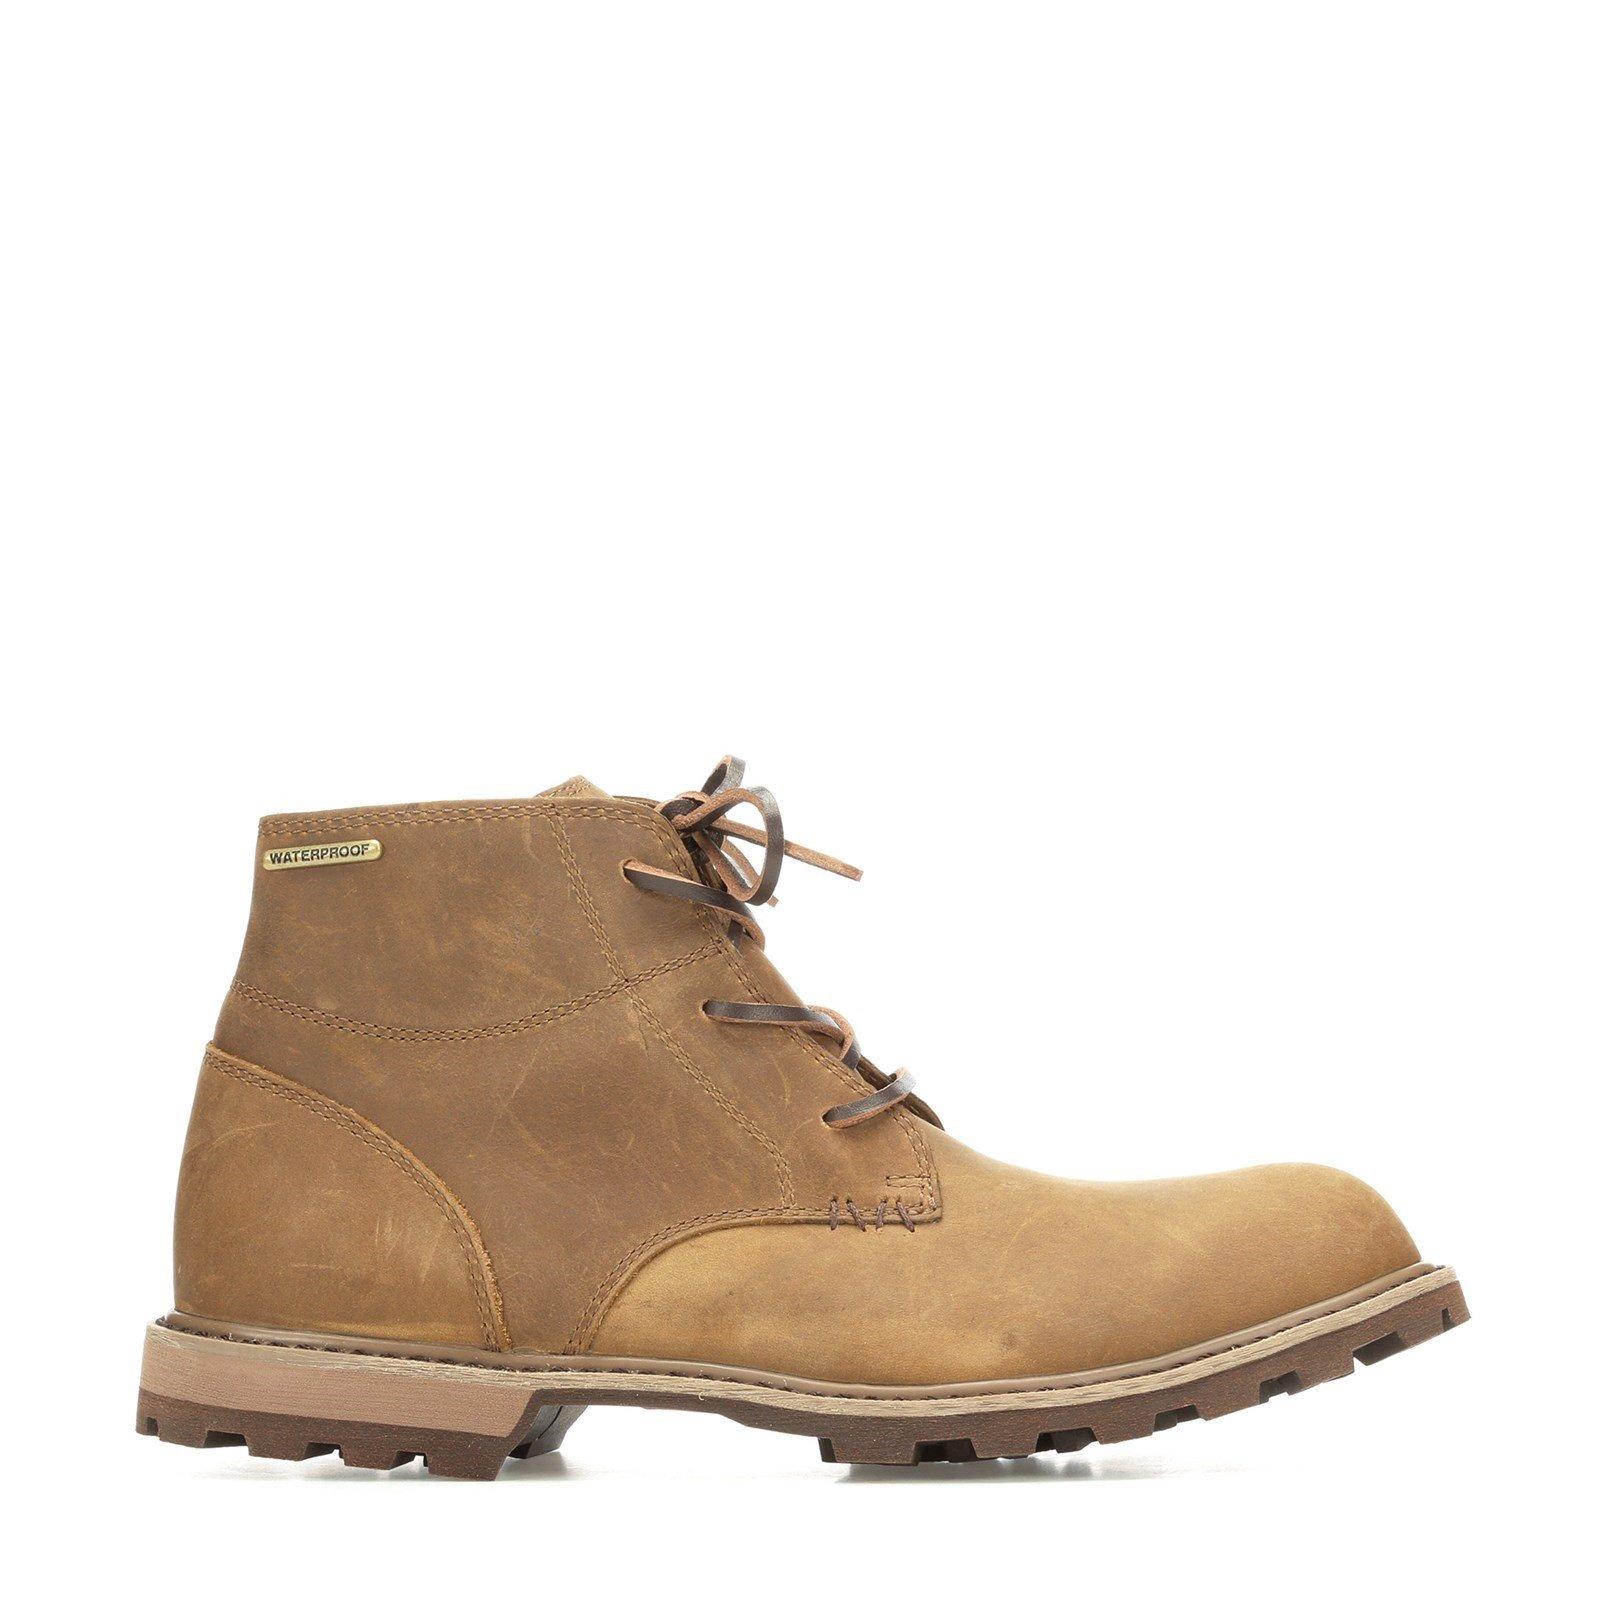 Muck Boots Men's Freeman Boot 31761 - Tan 7